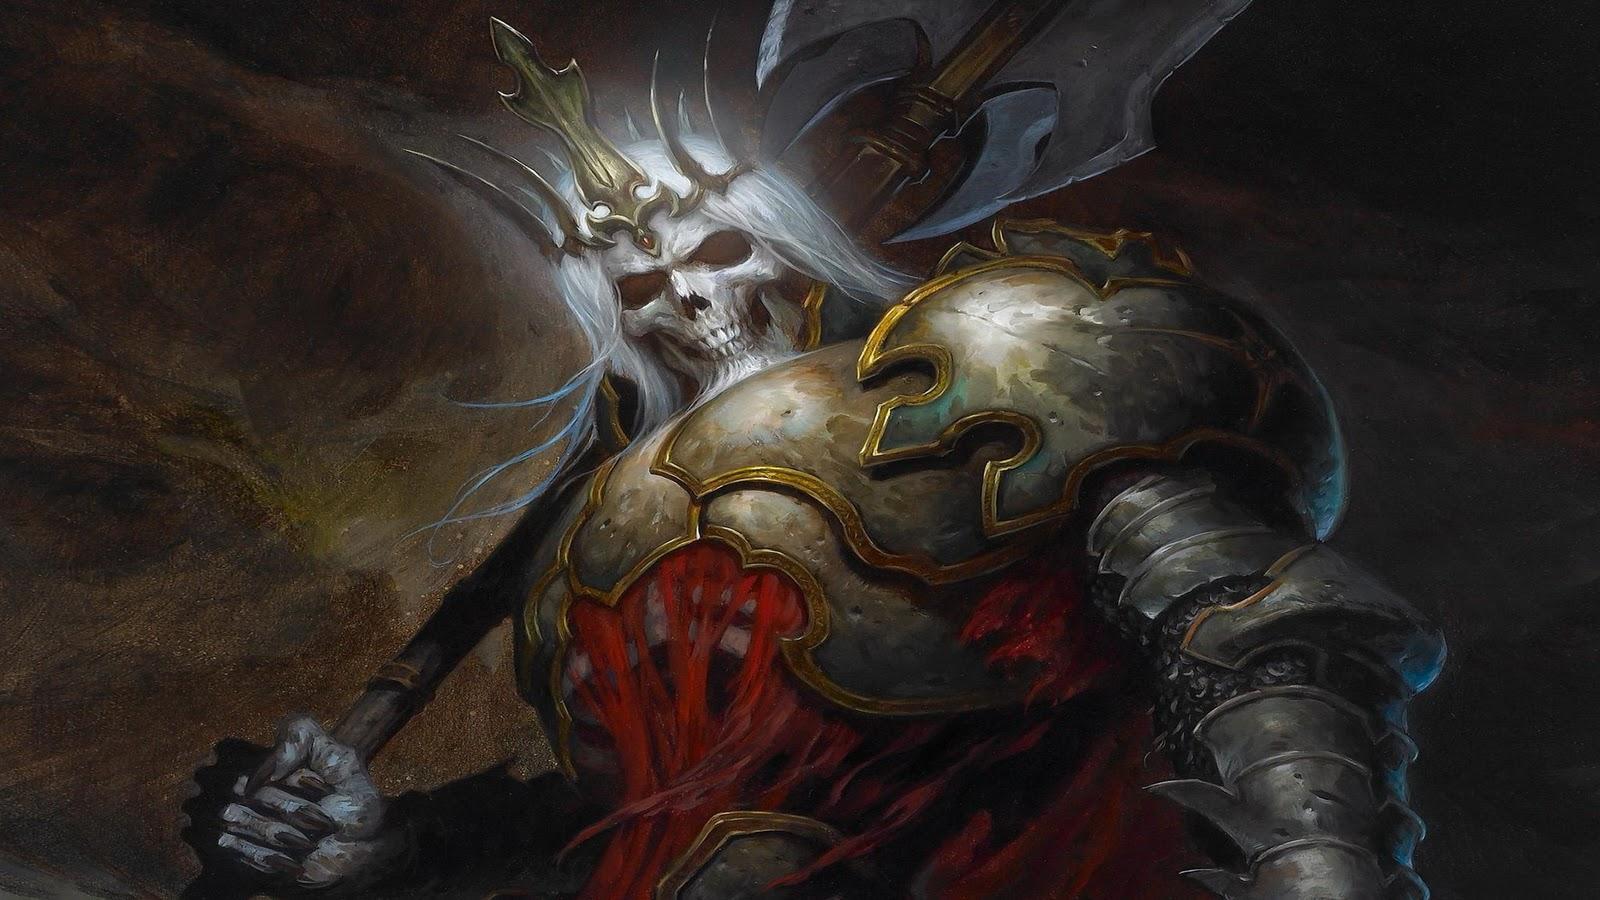 Wallpapers Photo Art: Diablo 3 Wallpaper, Diablo III